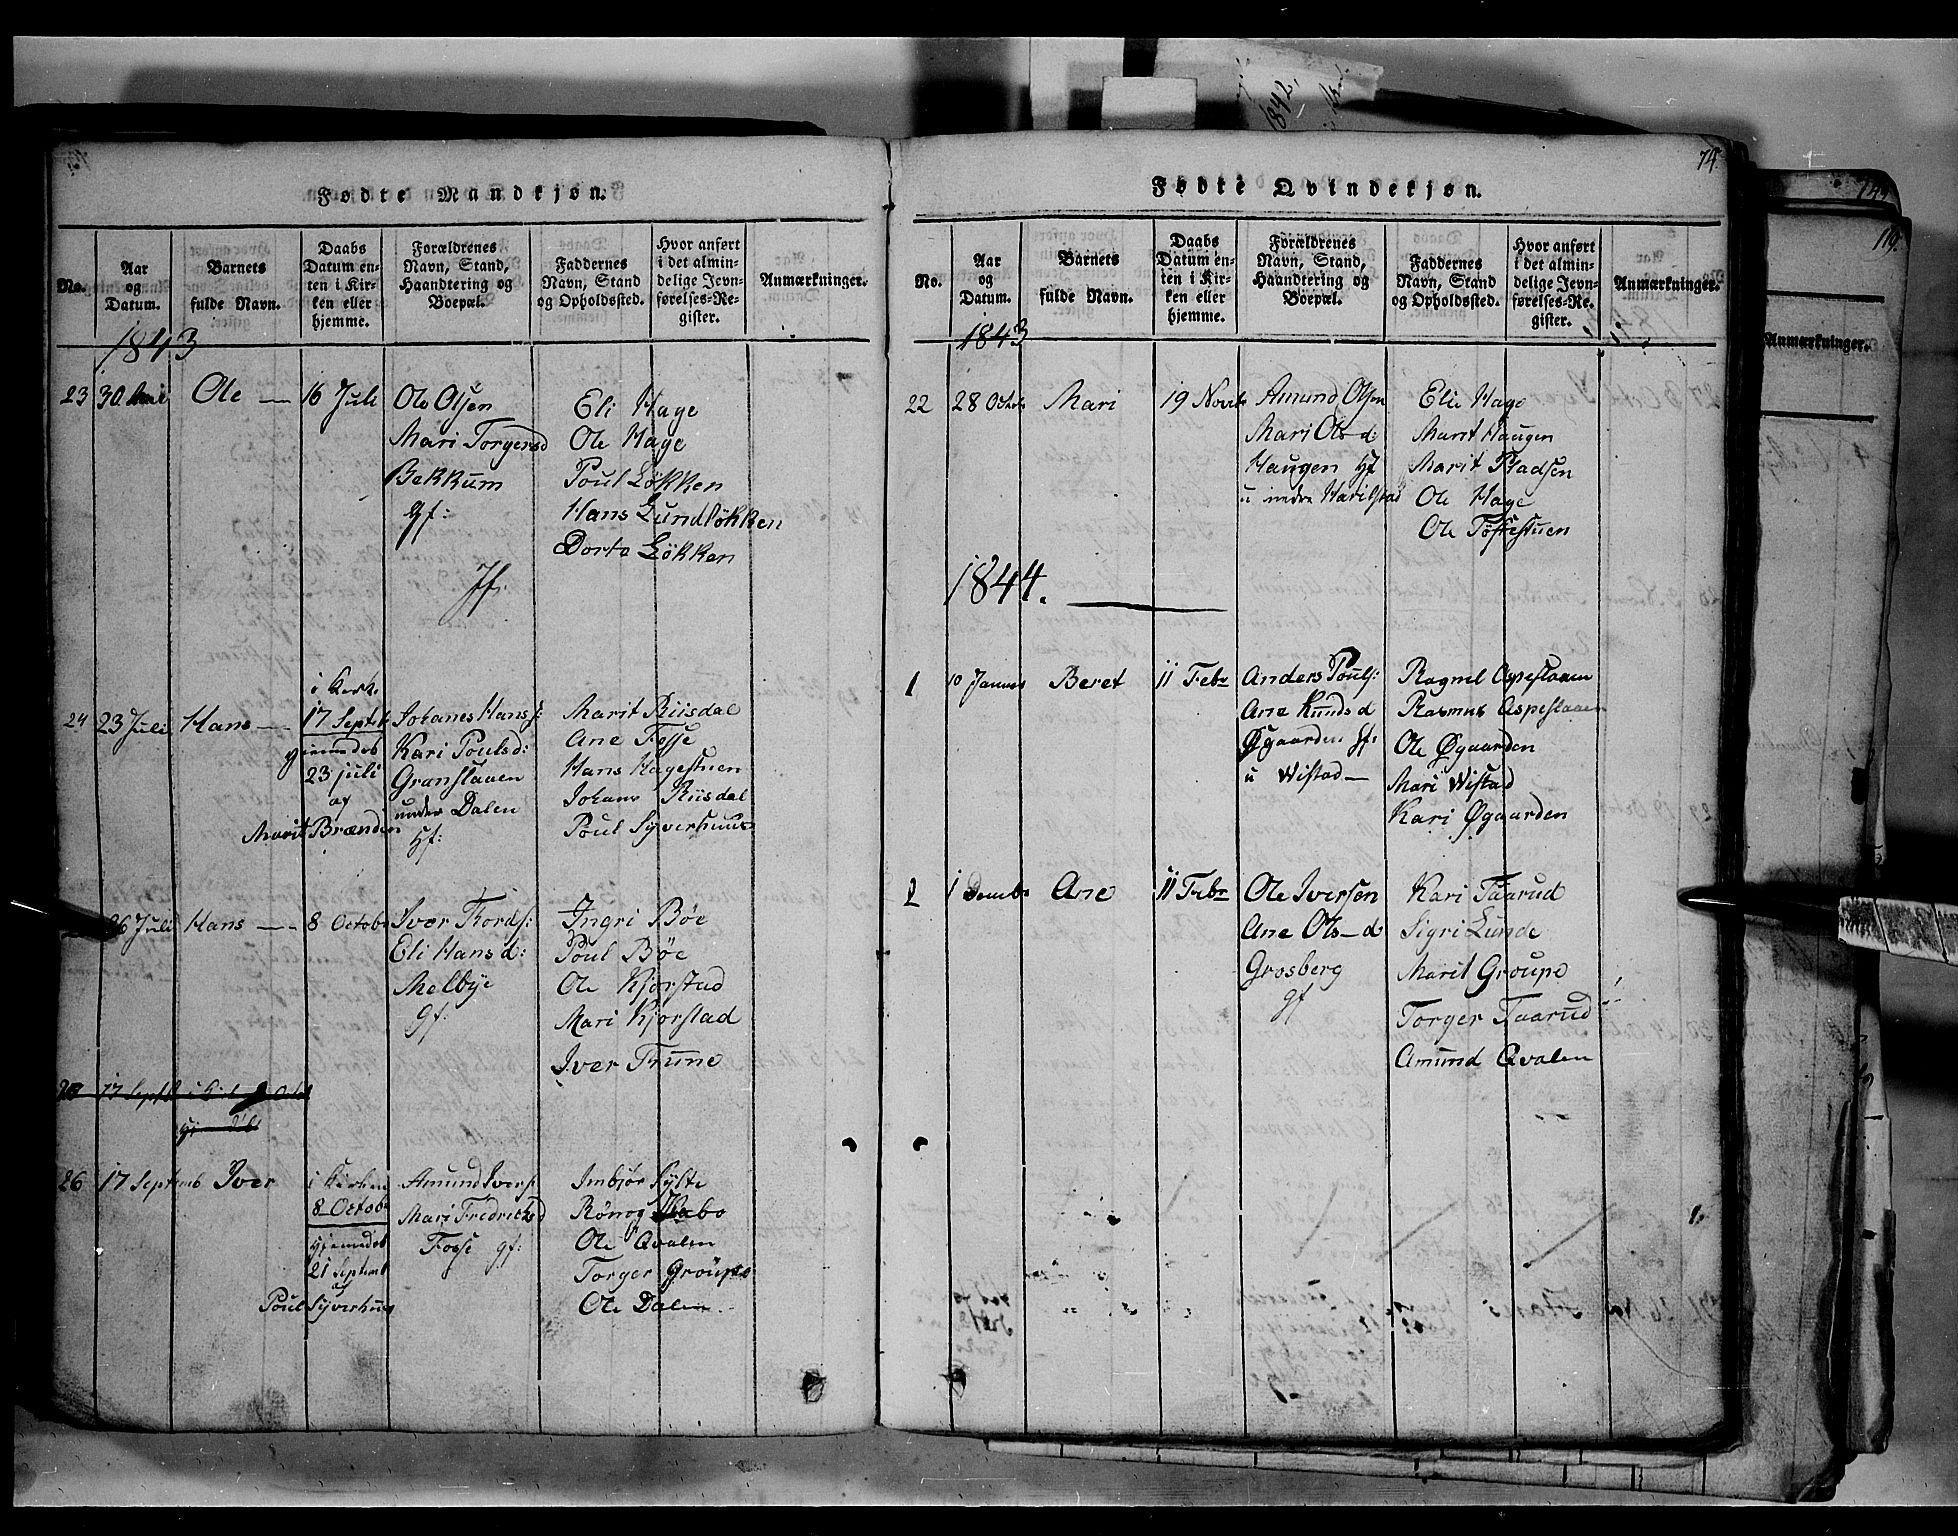 SAH, Fron prestekontor, H/Ha/Hab/L0003: Klokkerbok nr. 3, 1816-1850, s. 74